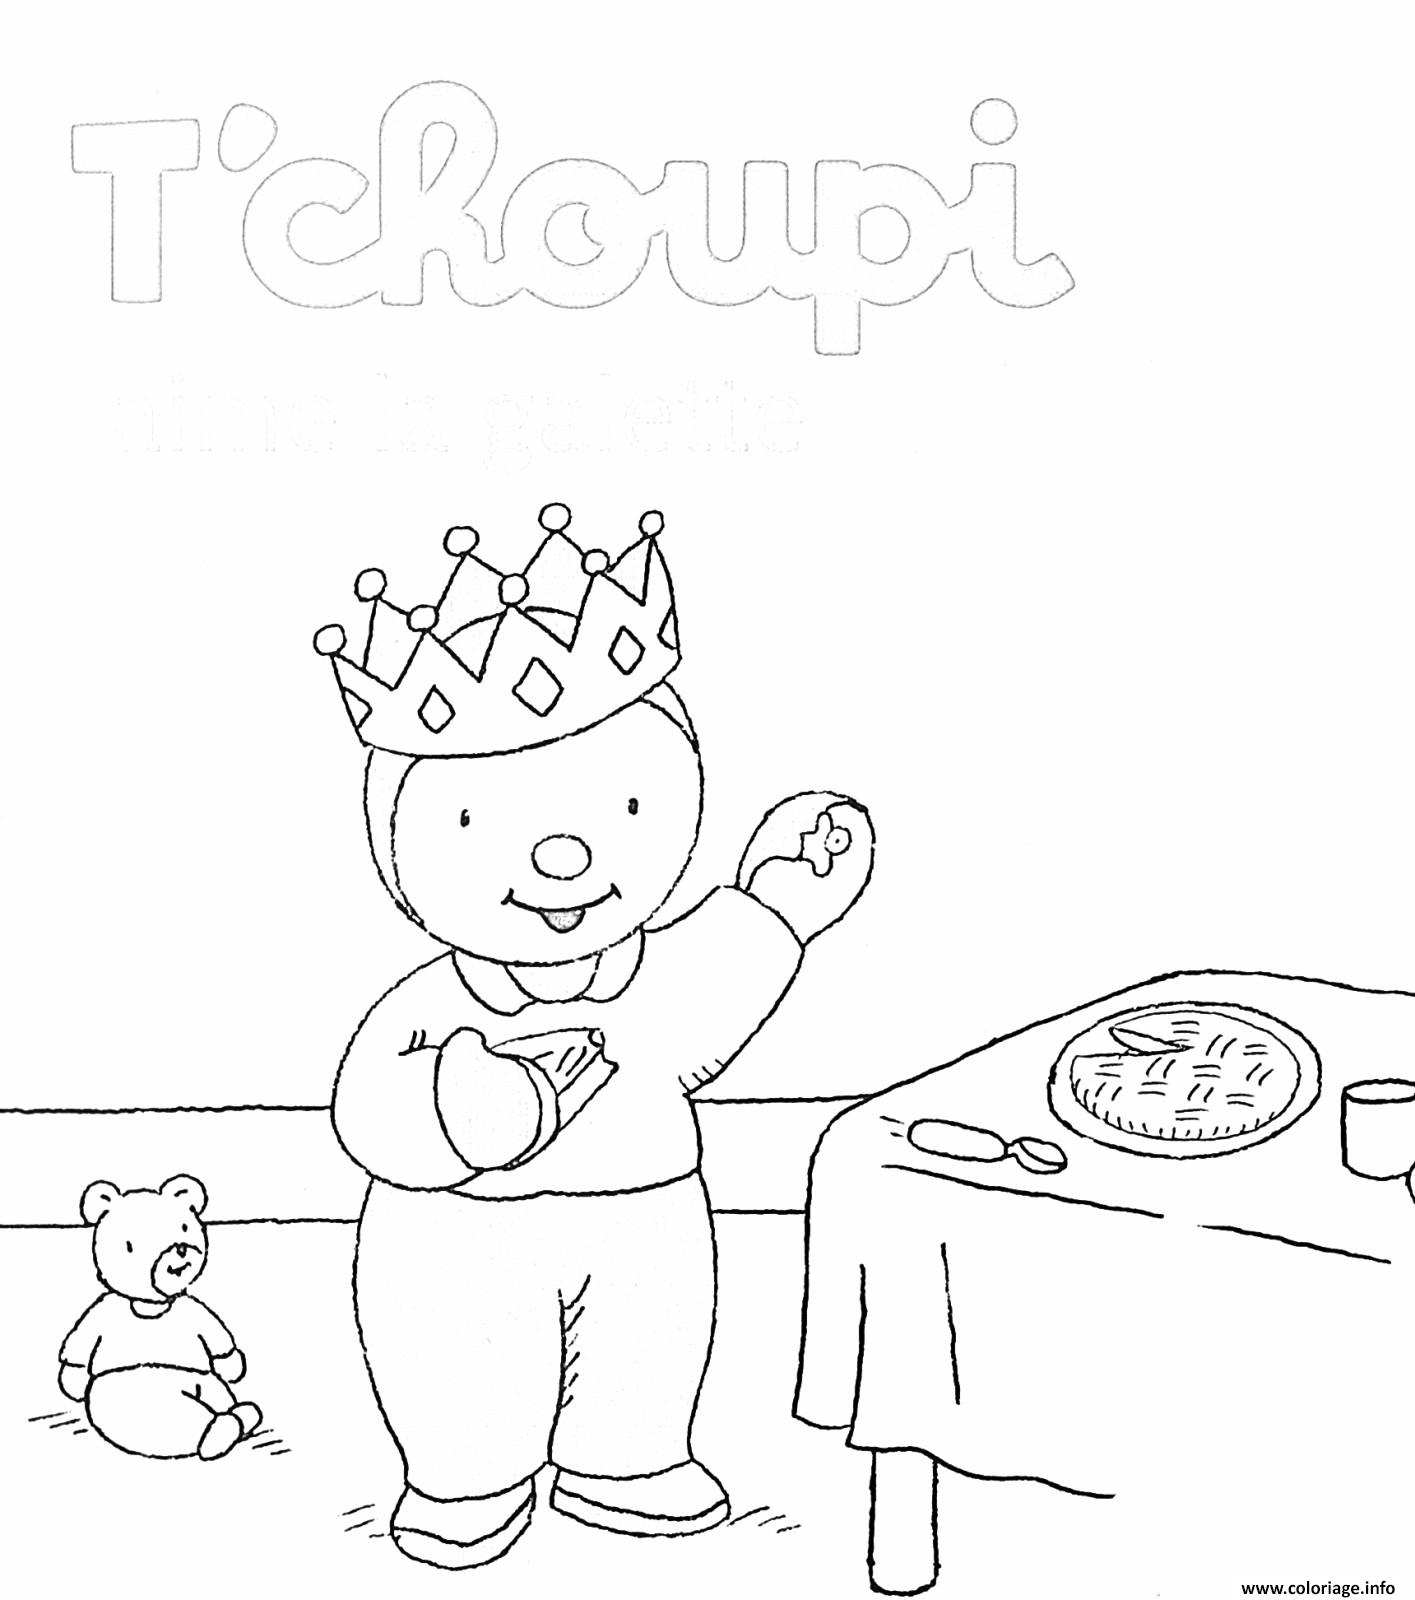 Coloriage tchoupi 225 dessin - Coloriage tchoupi imprimer ...